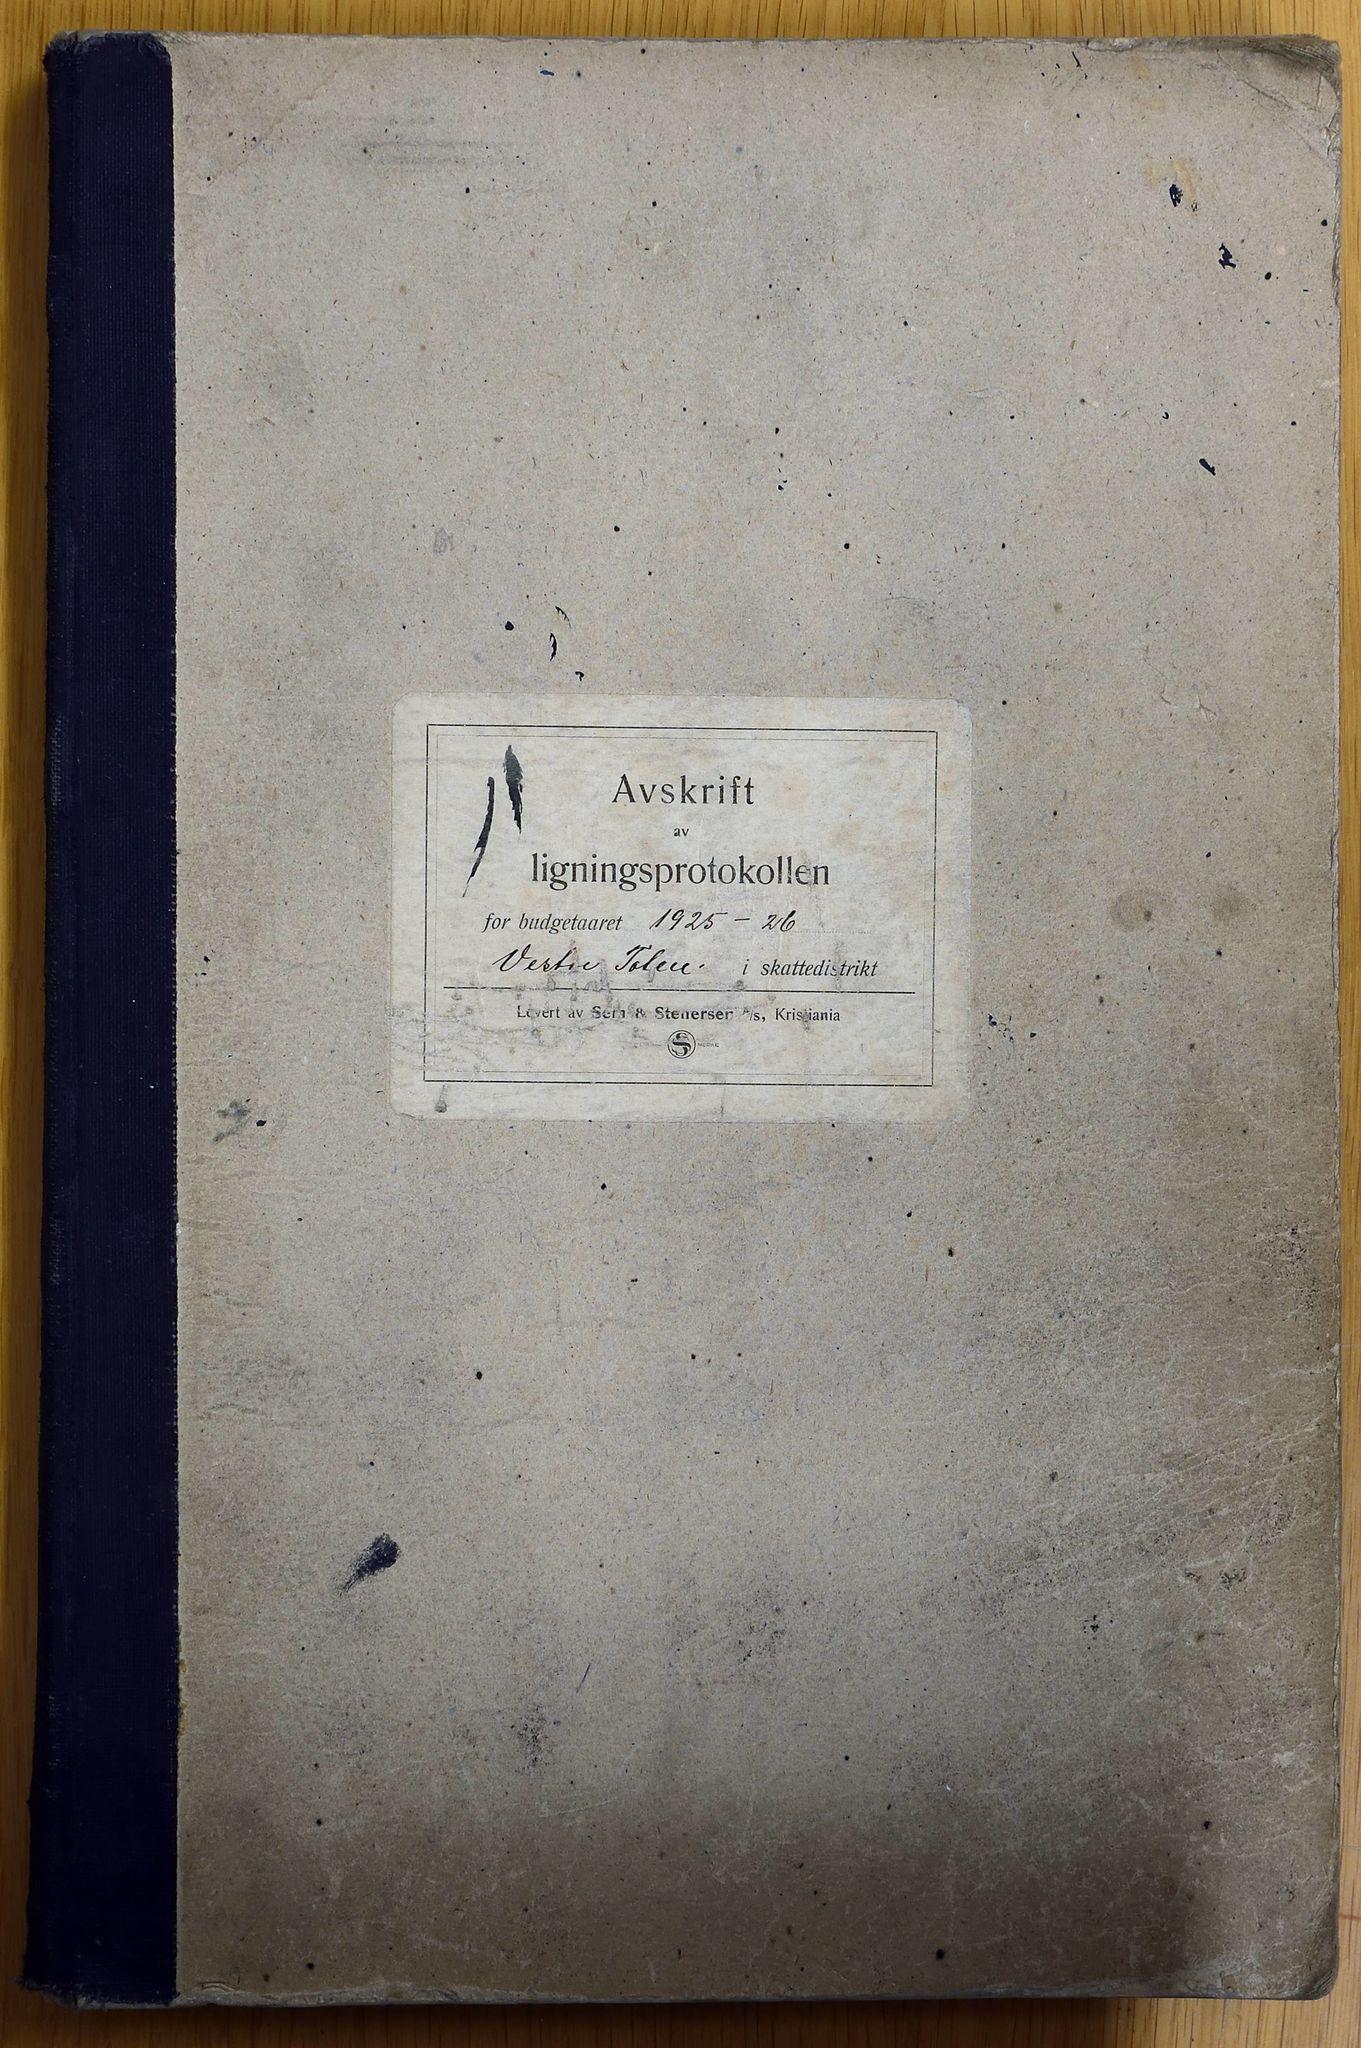 KVT, Vestre Toten municipality archive – Vestre Toten, Tax assessment protocol 1925-1926, 1925-1926